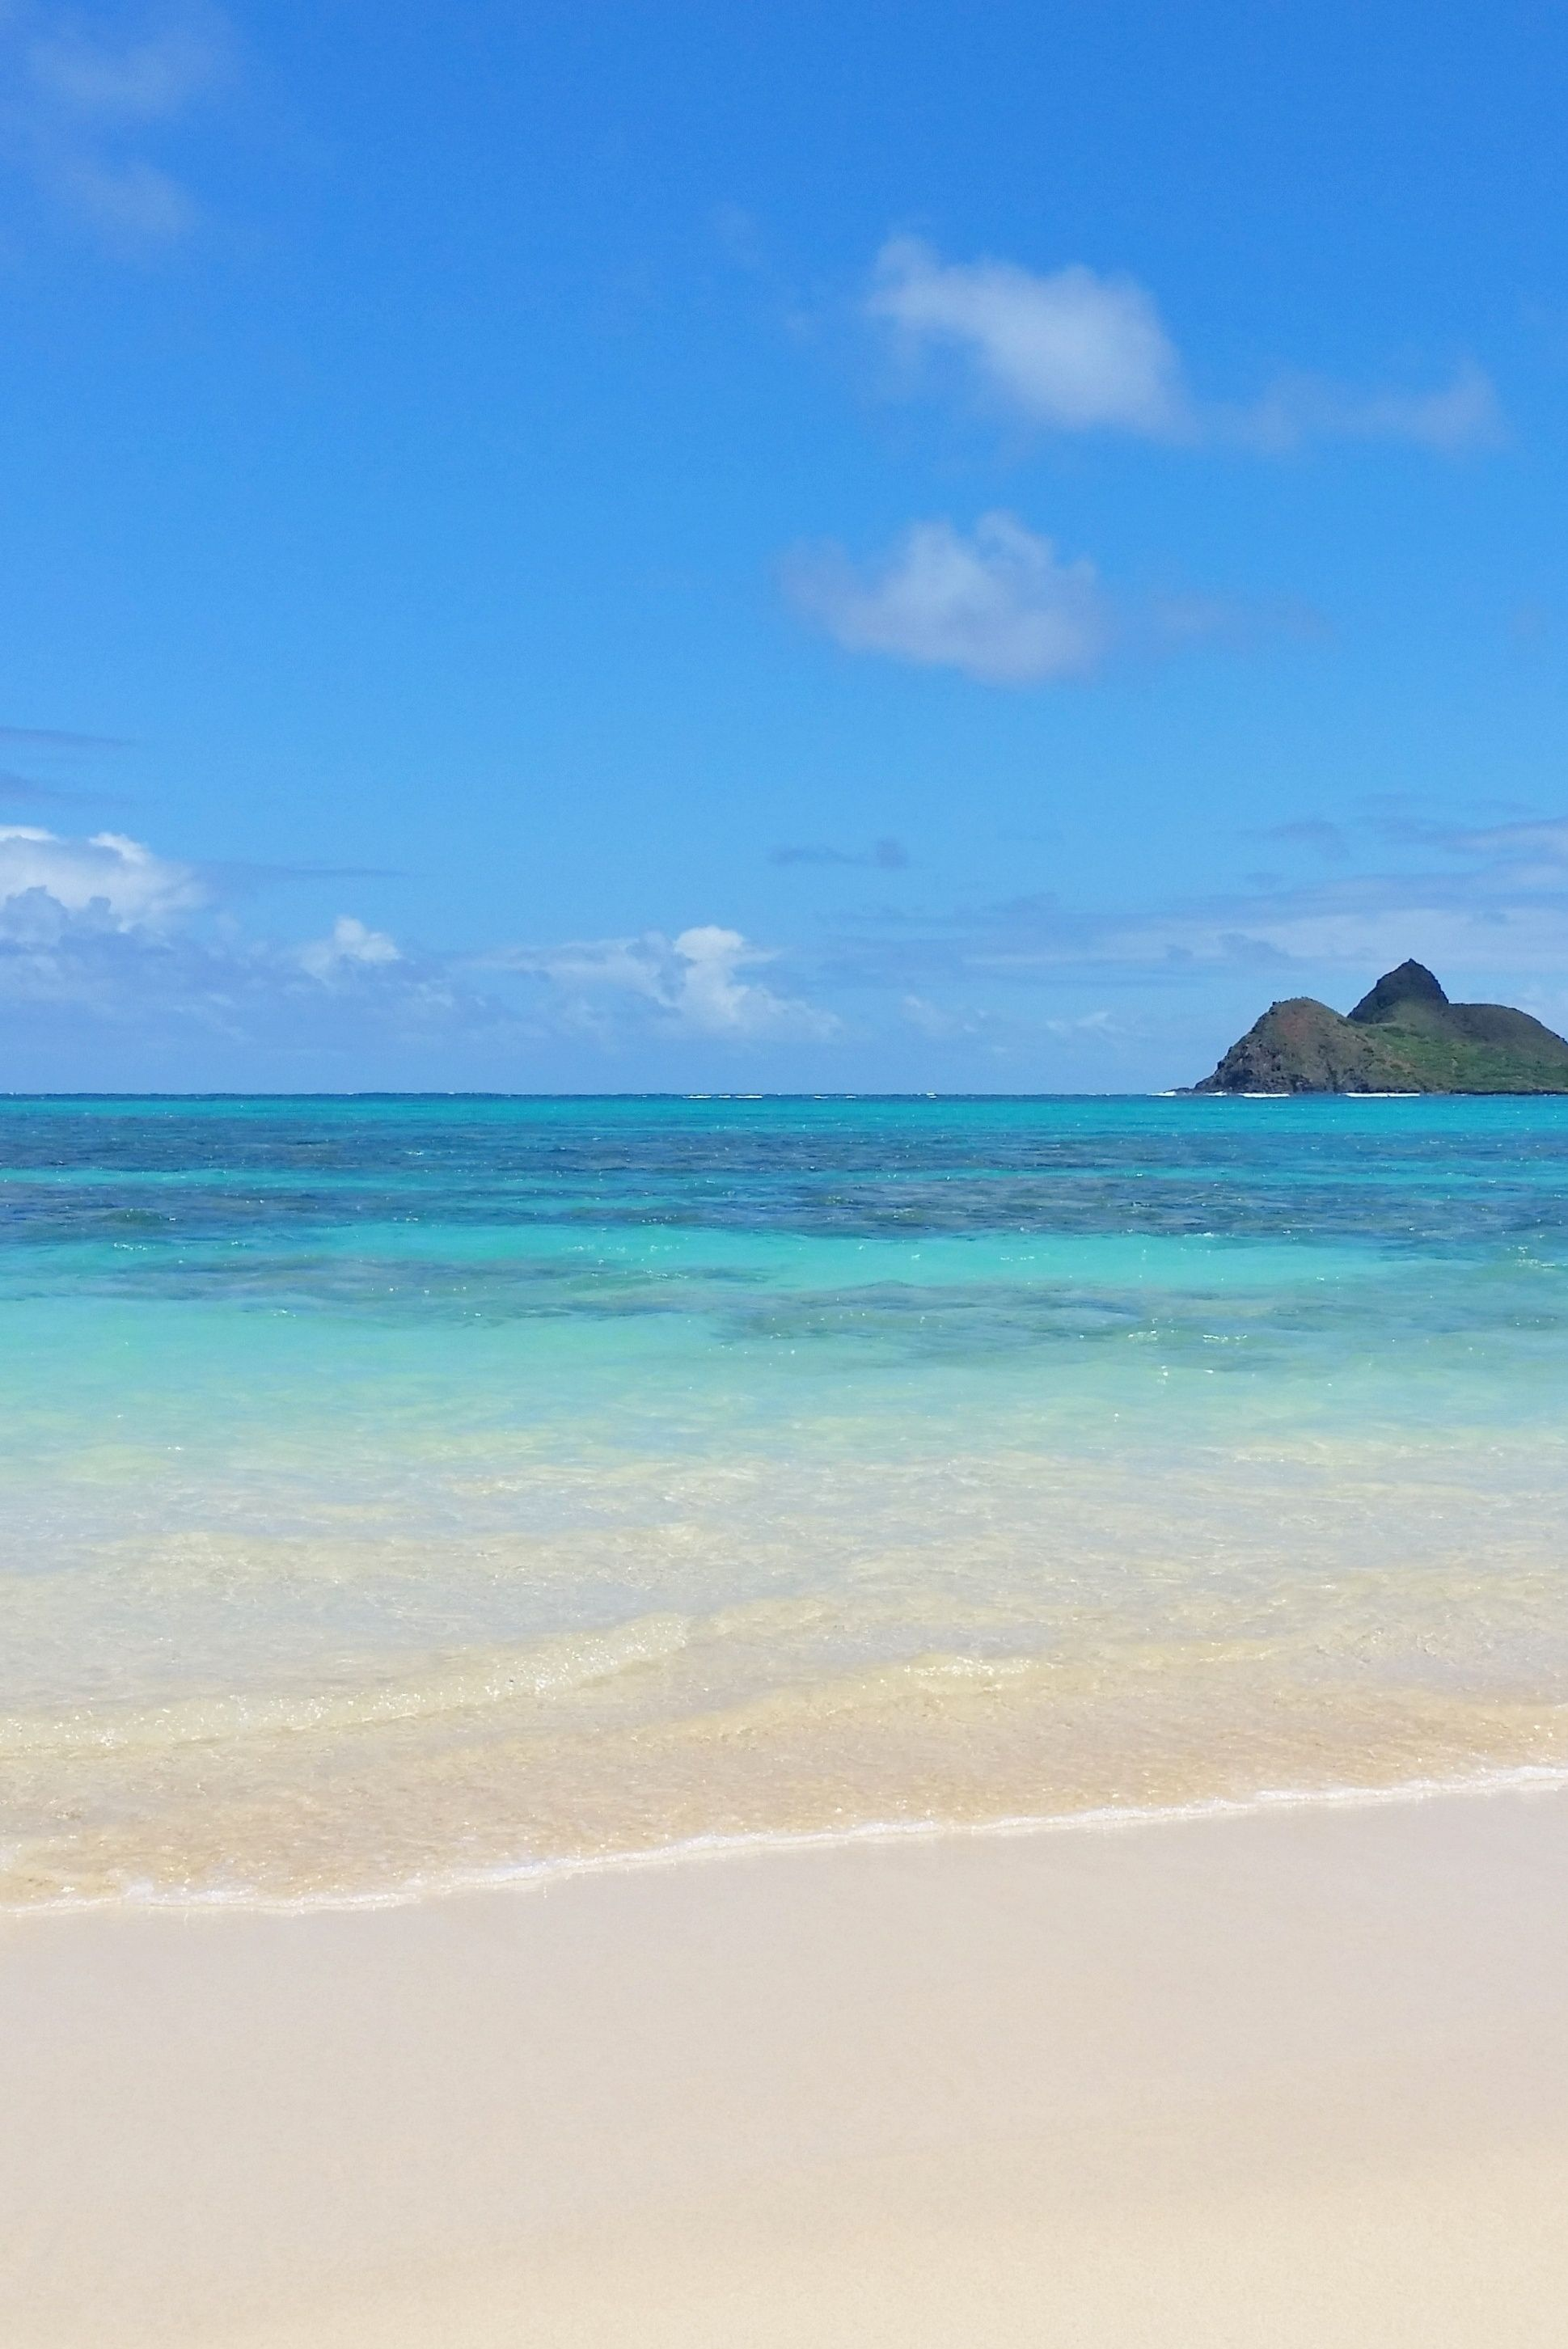 Best Oahu beaches EAST SIDE OAHU + Things to do near windward coast beaches 🌴 Hawaii travel blog